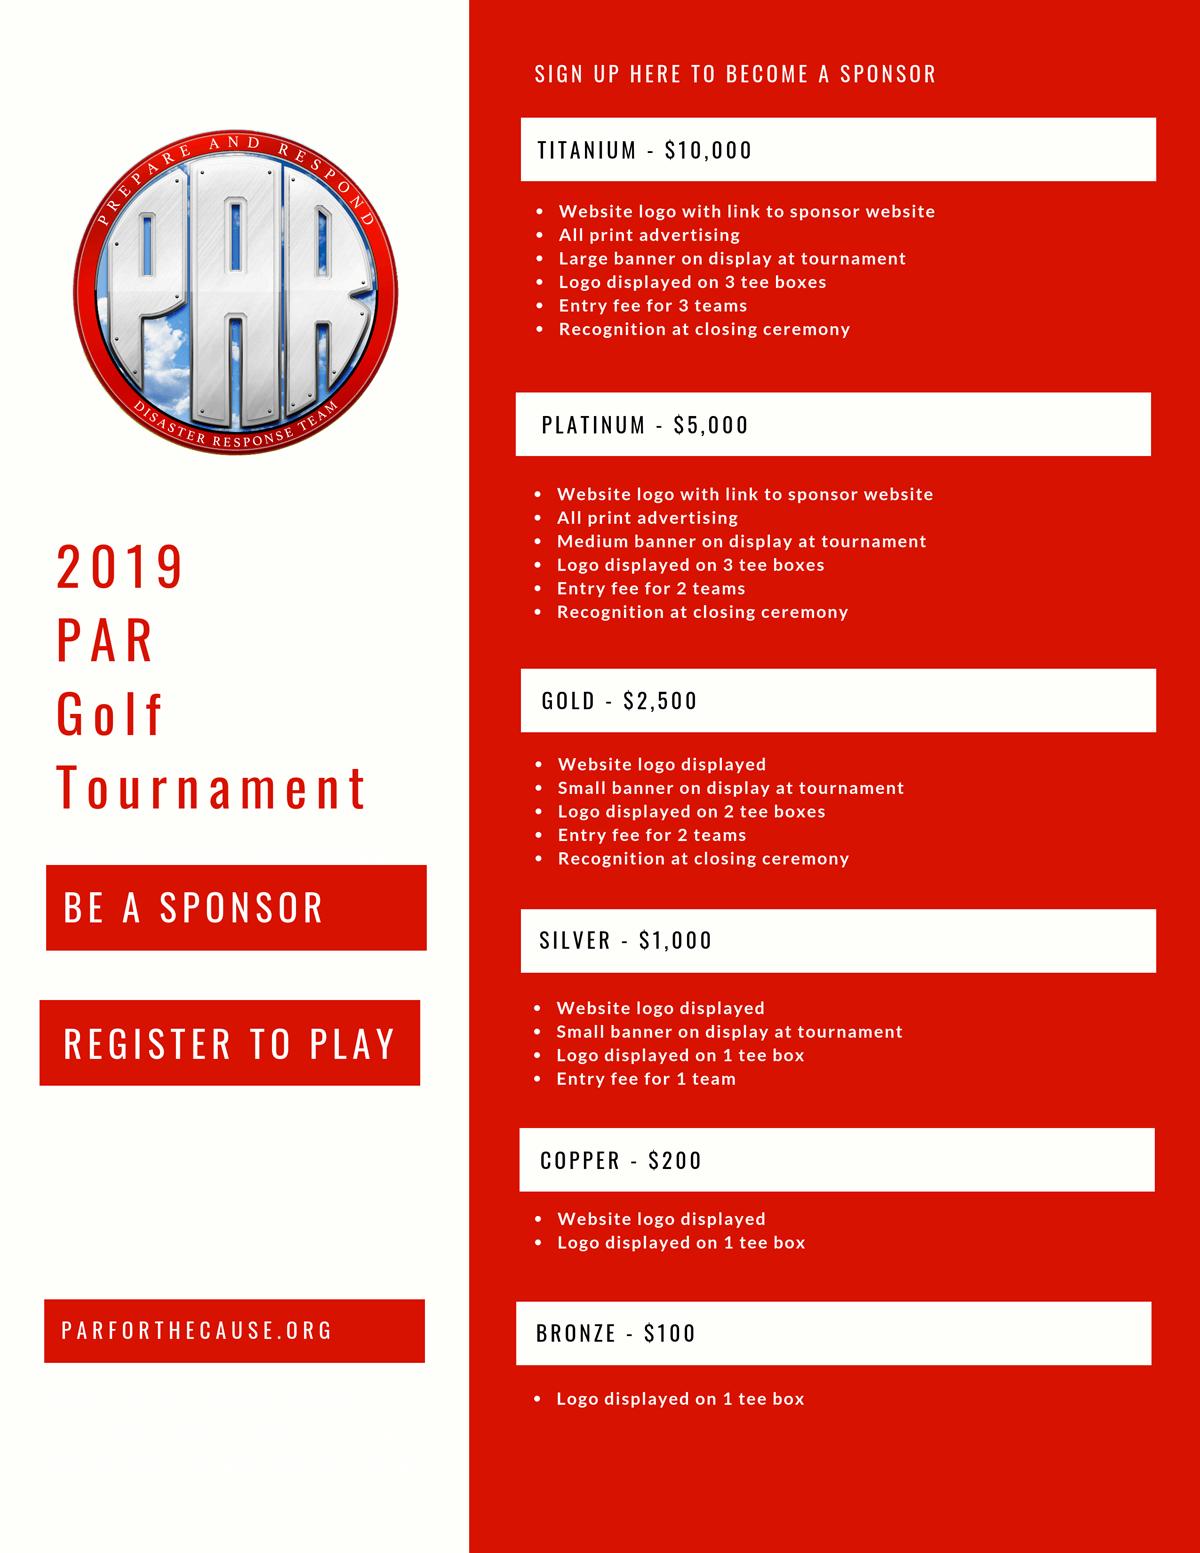 2019 PAR Golf Sponsorship